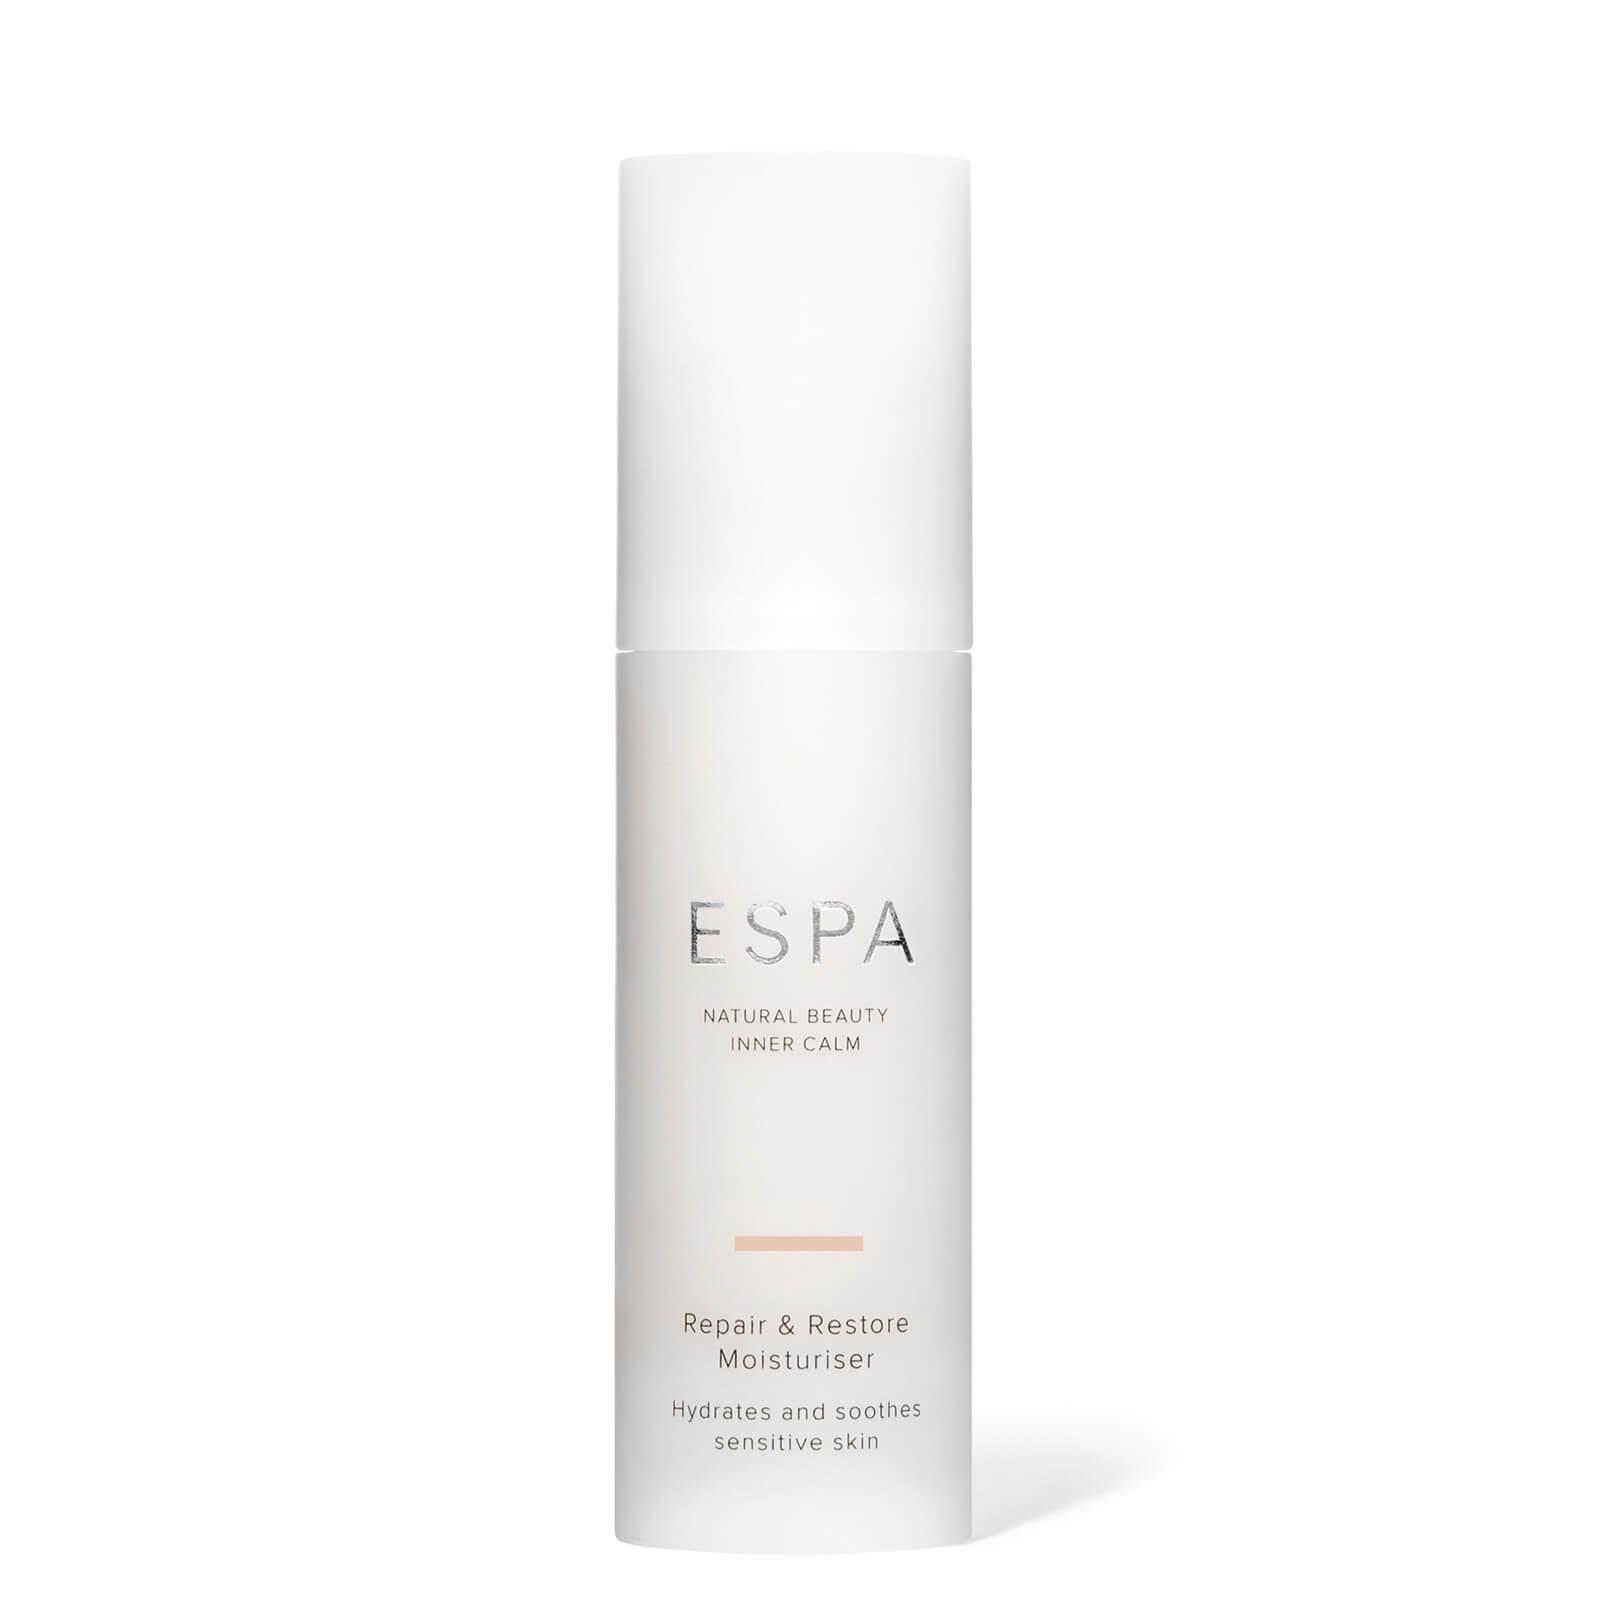 ESPA Hydratant Réparation et Restauration Repair&Restore Moisturiser ESPA 35ml